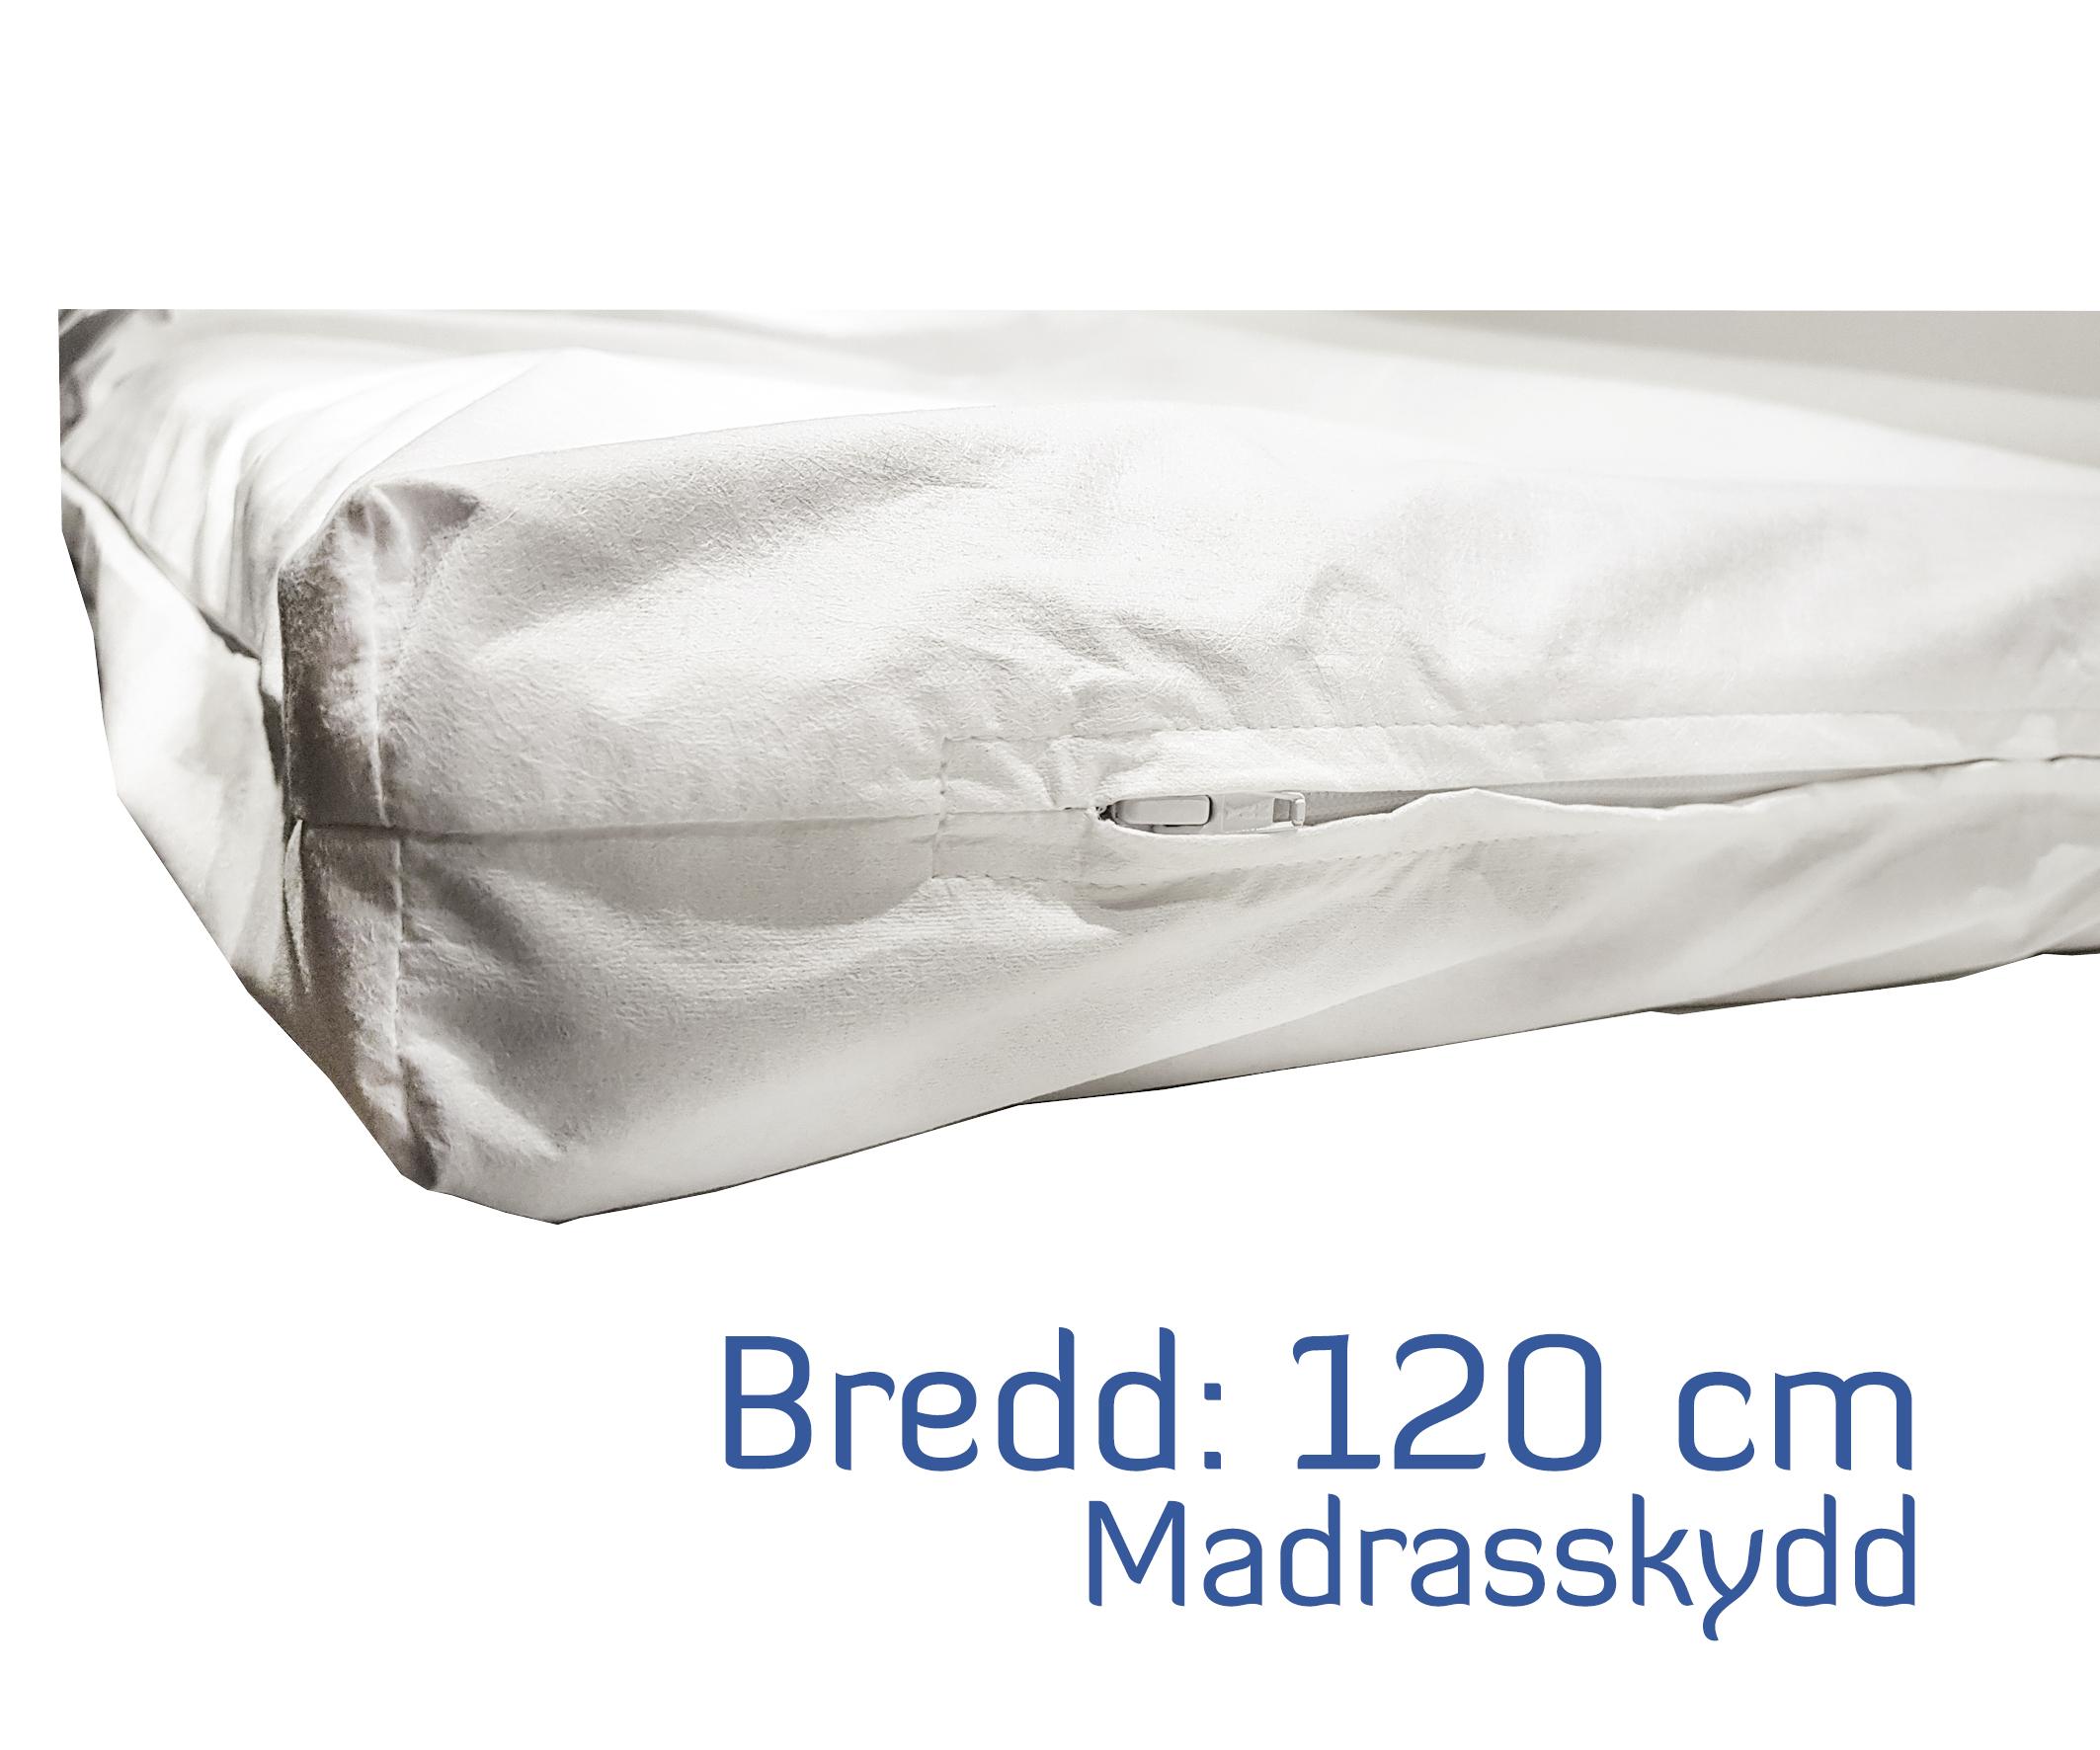 Madrasskydd 120 cm_webbshop